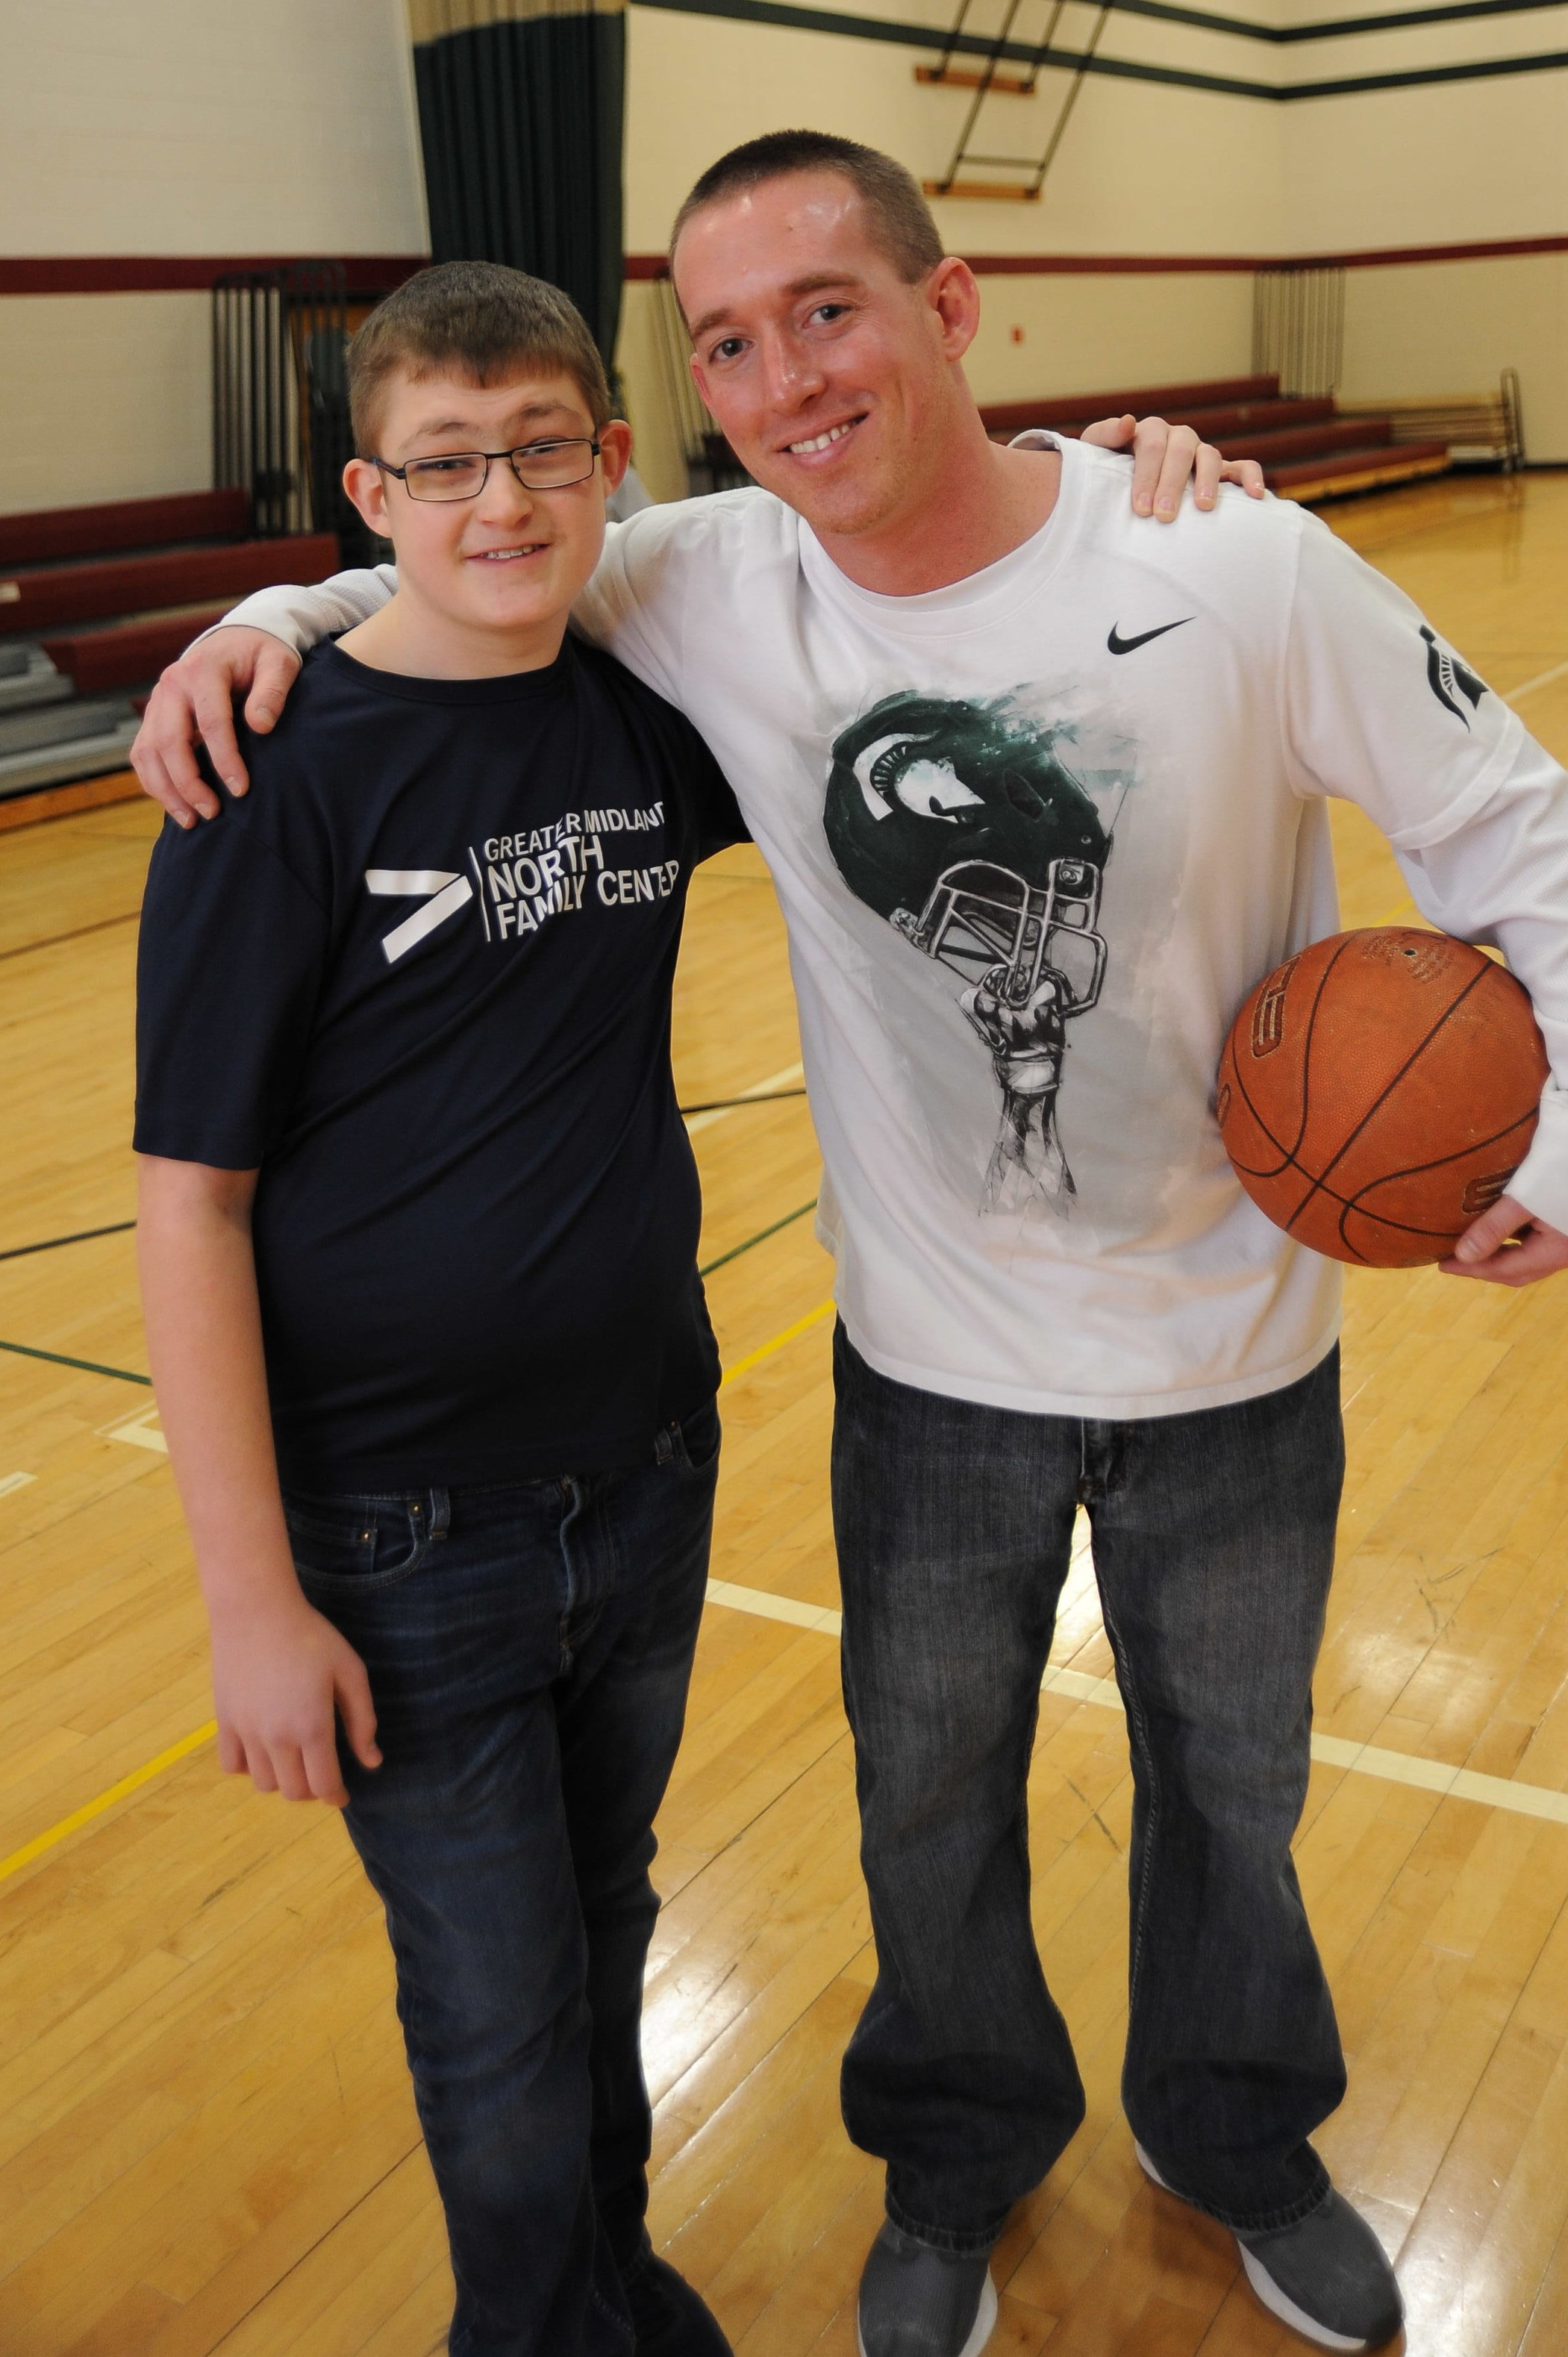 Jacob Laczko and Kyle Tomasi